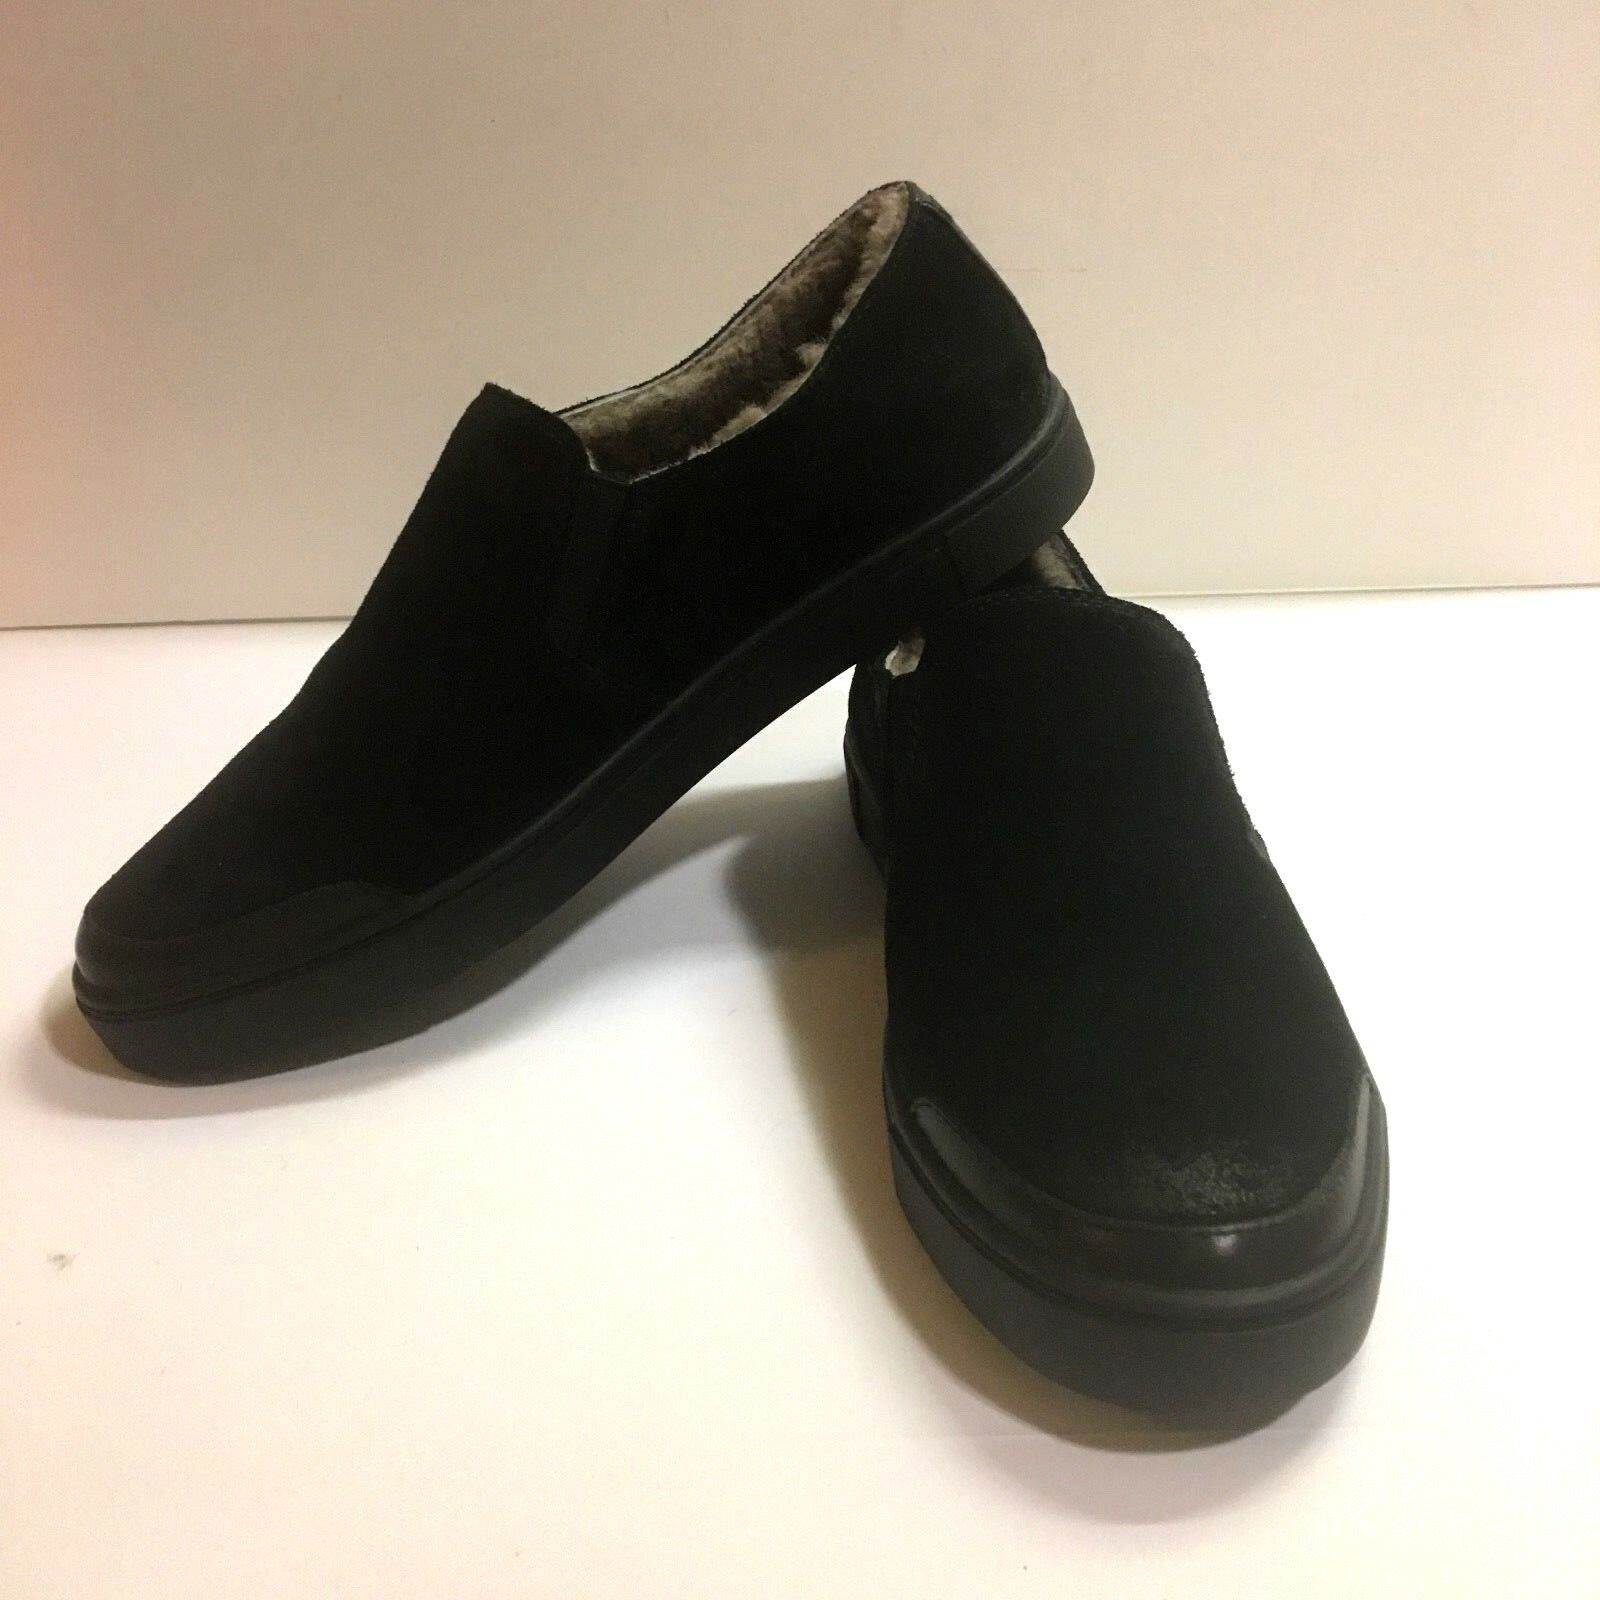 Frye 9 noir GEMMA Shearling Lacet Chaussures Daim effet vieilli cuir